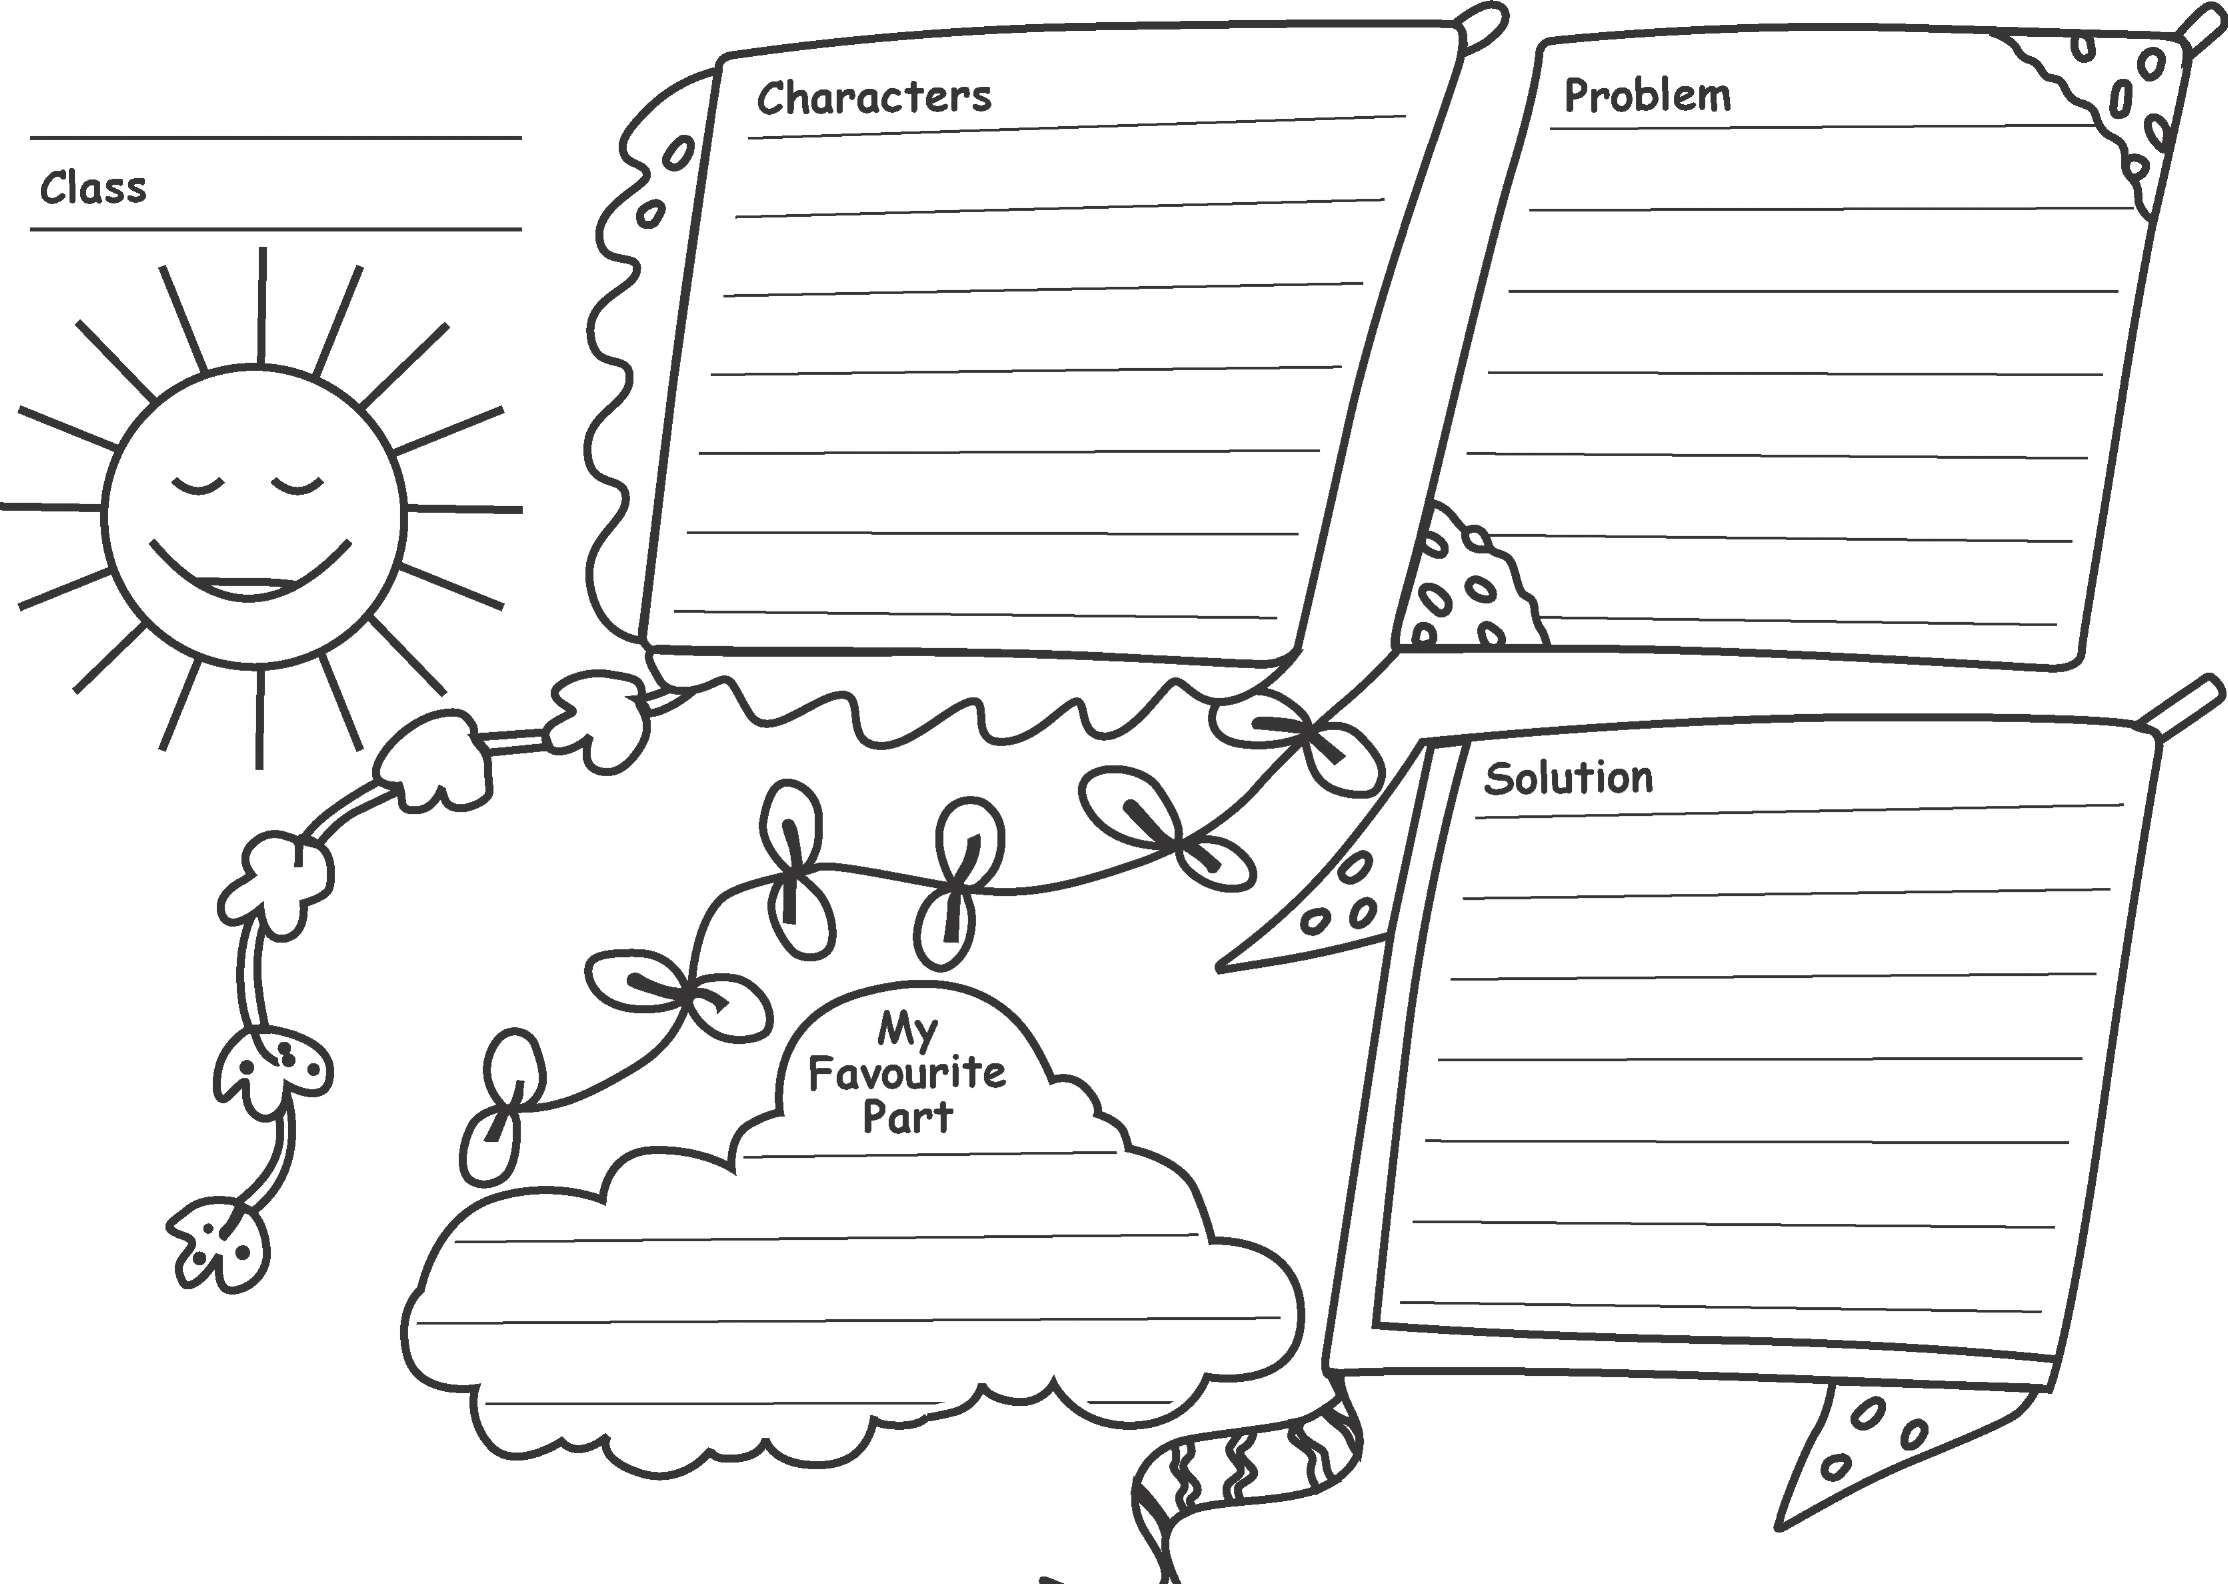 Short Story Kite Organizer Kite Graphic Organizers My Favorite Part [ 1584 x 2228 Pixel ]